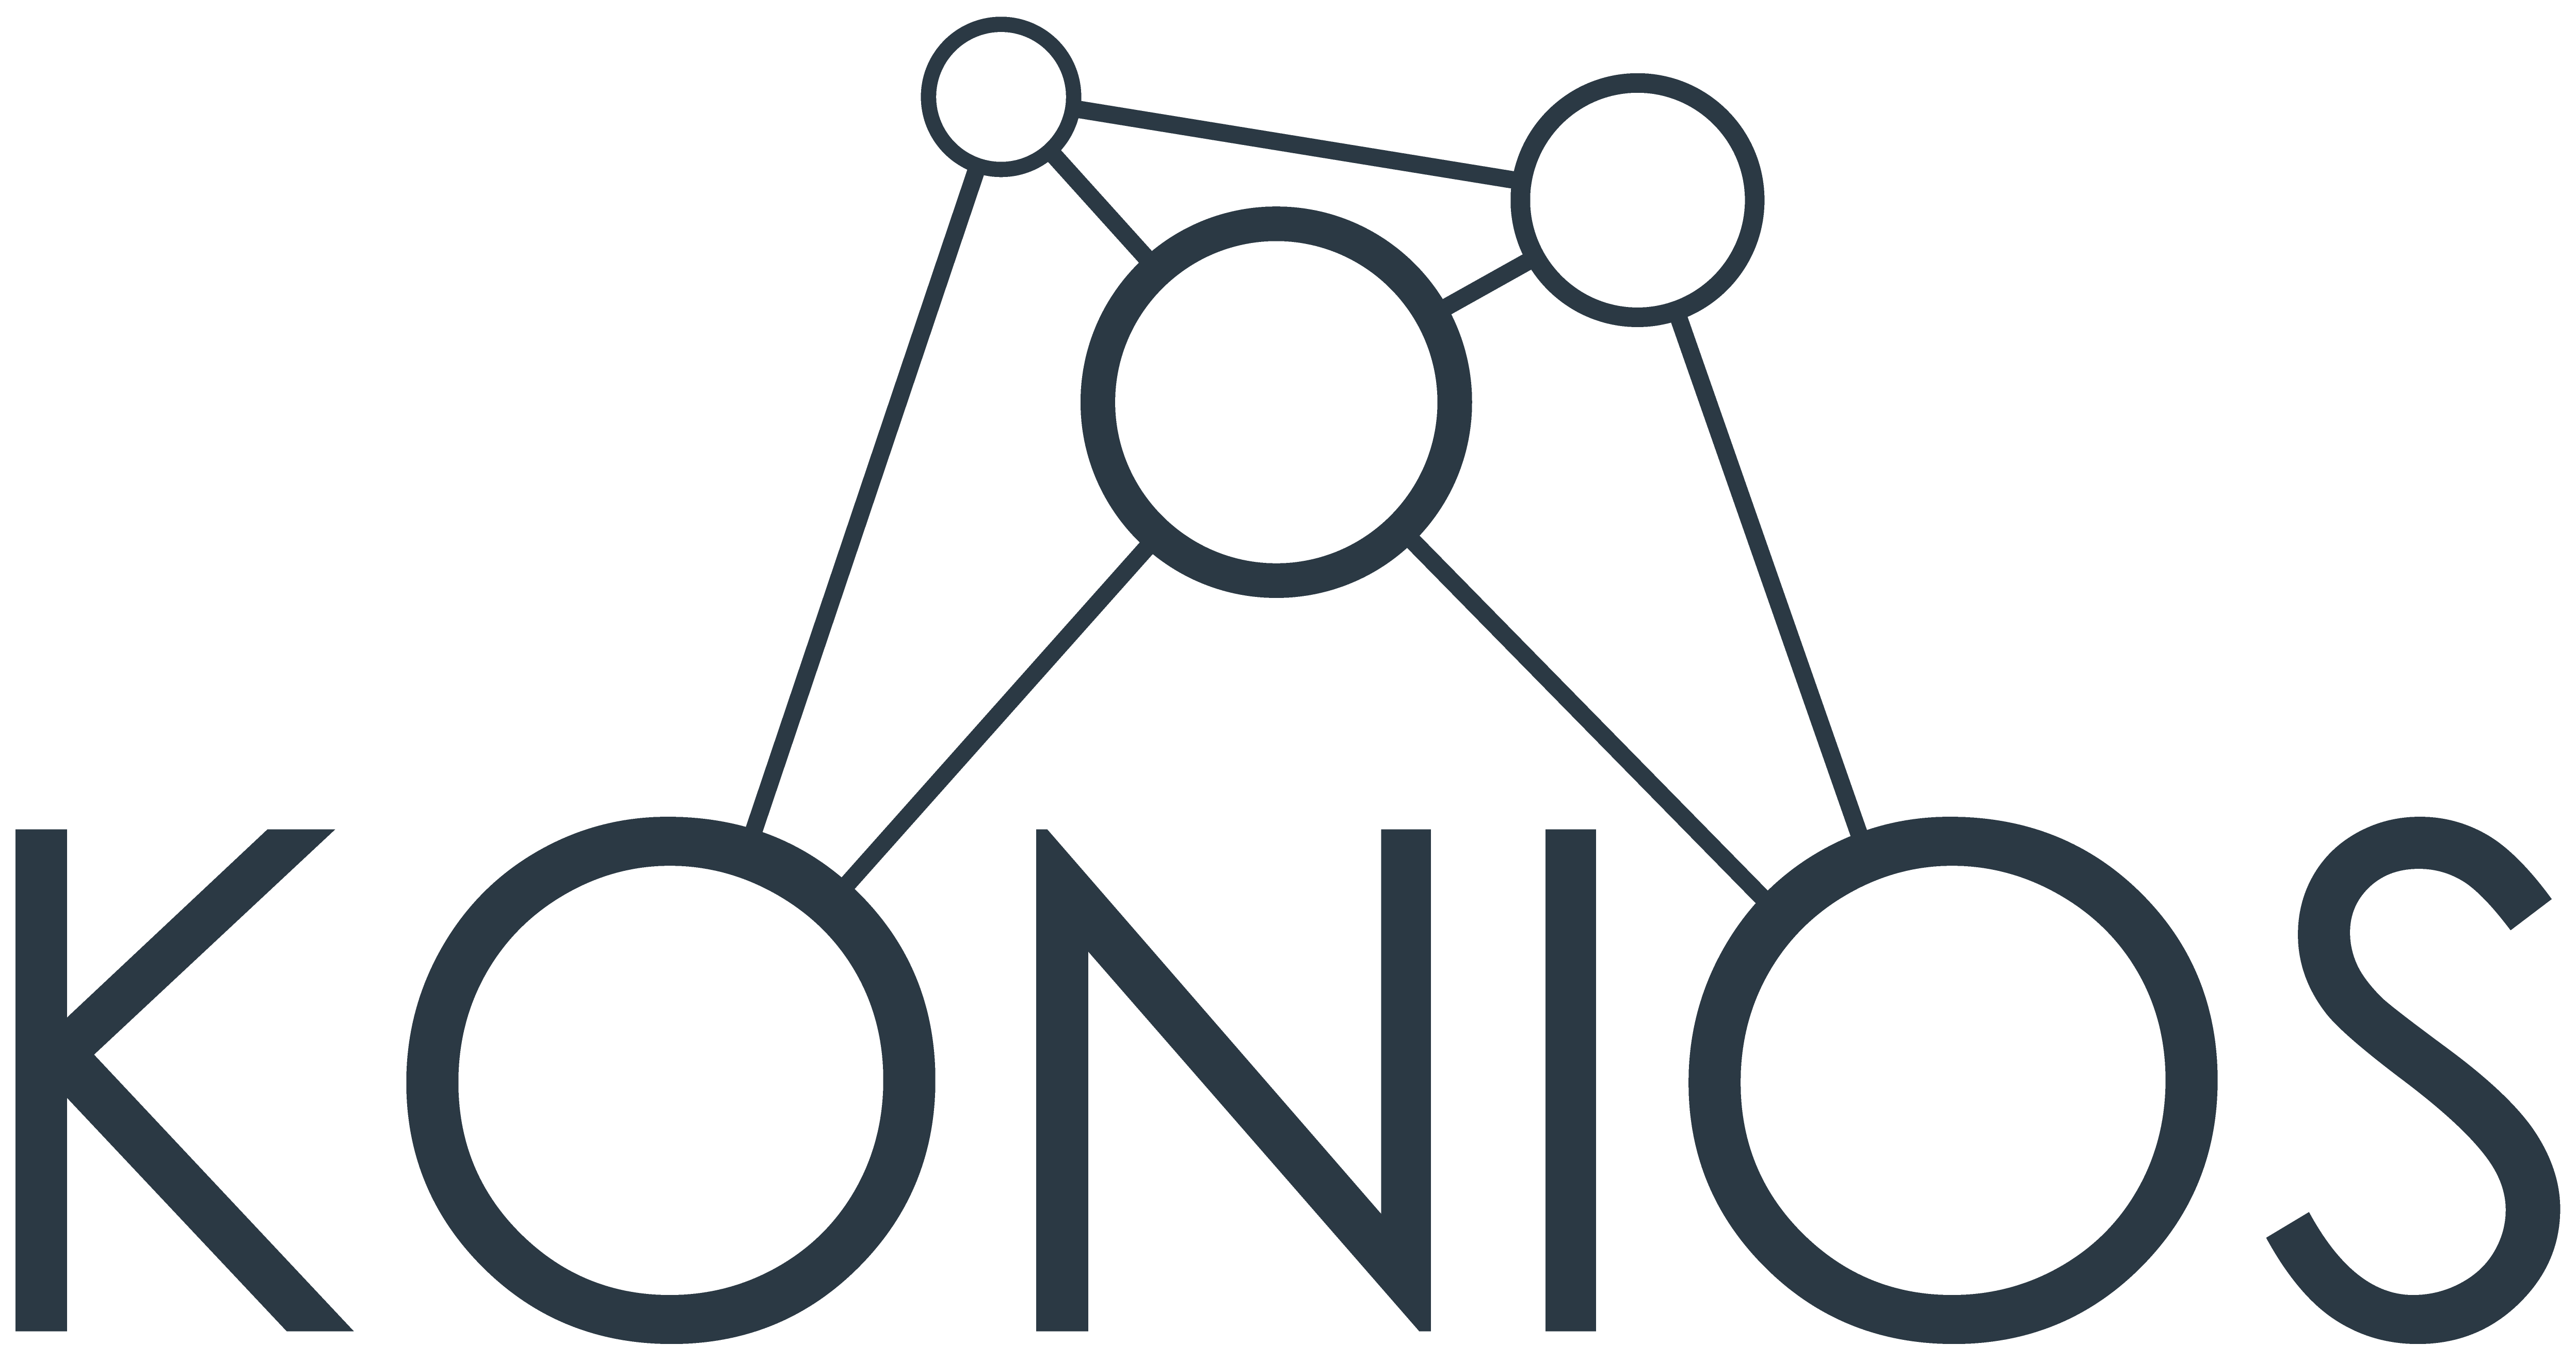 konios-logo-anthrazit-01.png